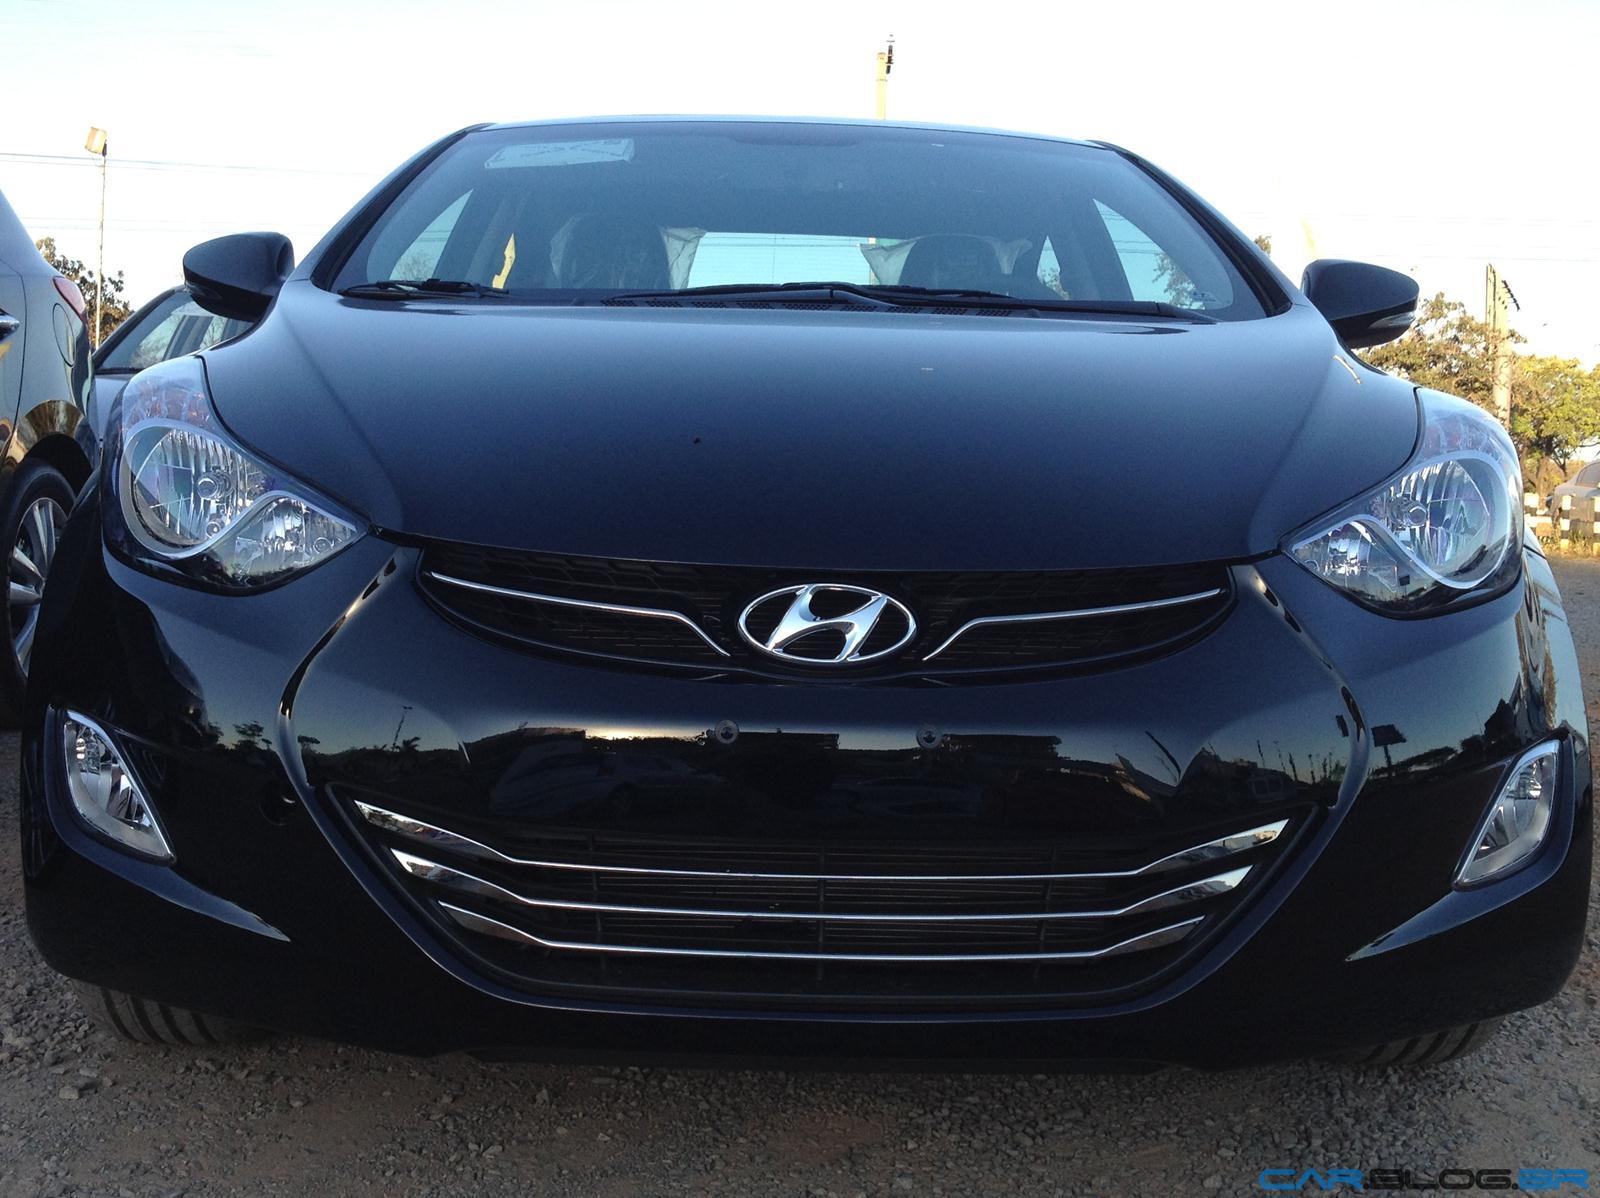 Modelos De Carro Hyundai Tucson 2013.html | Autos Weblog